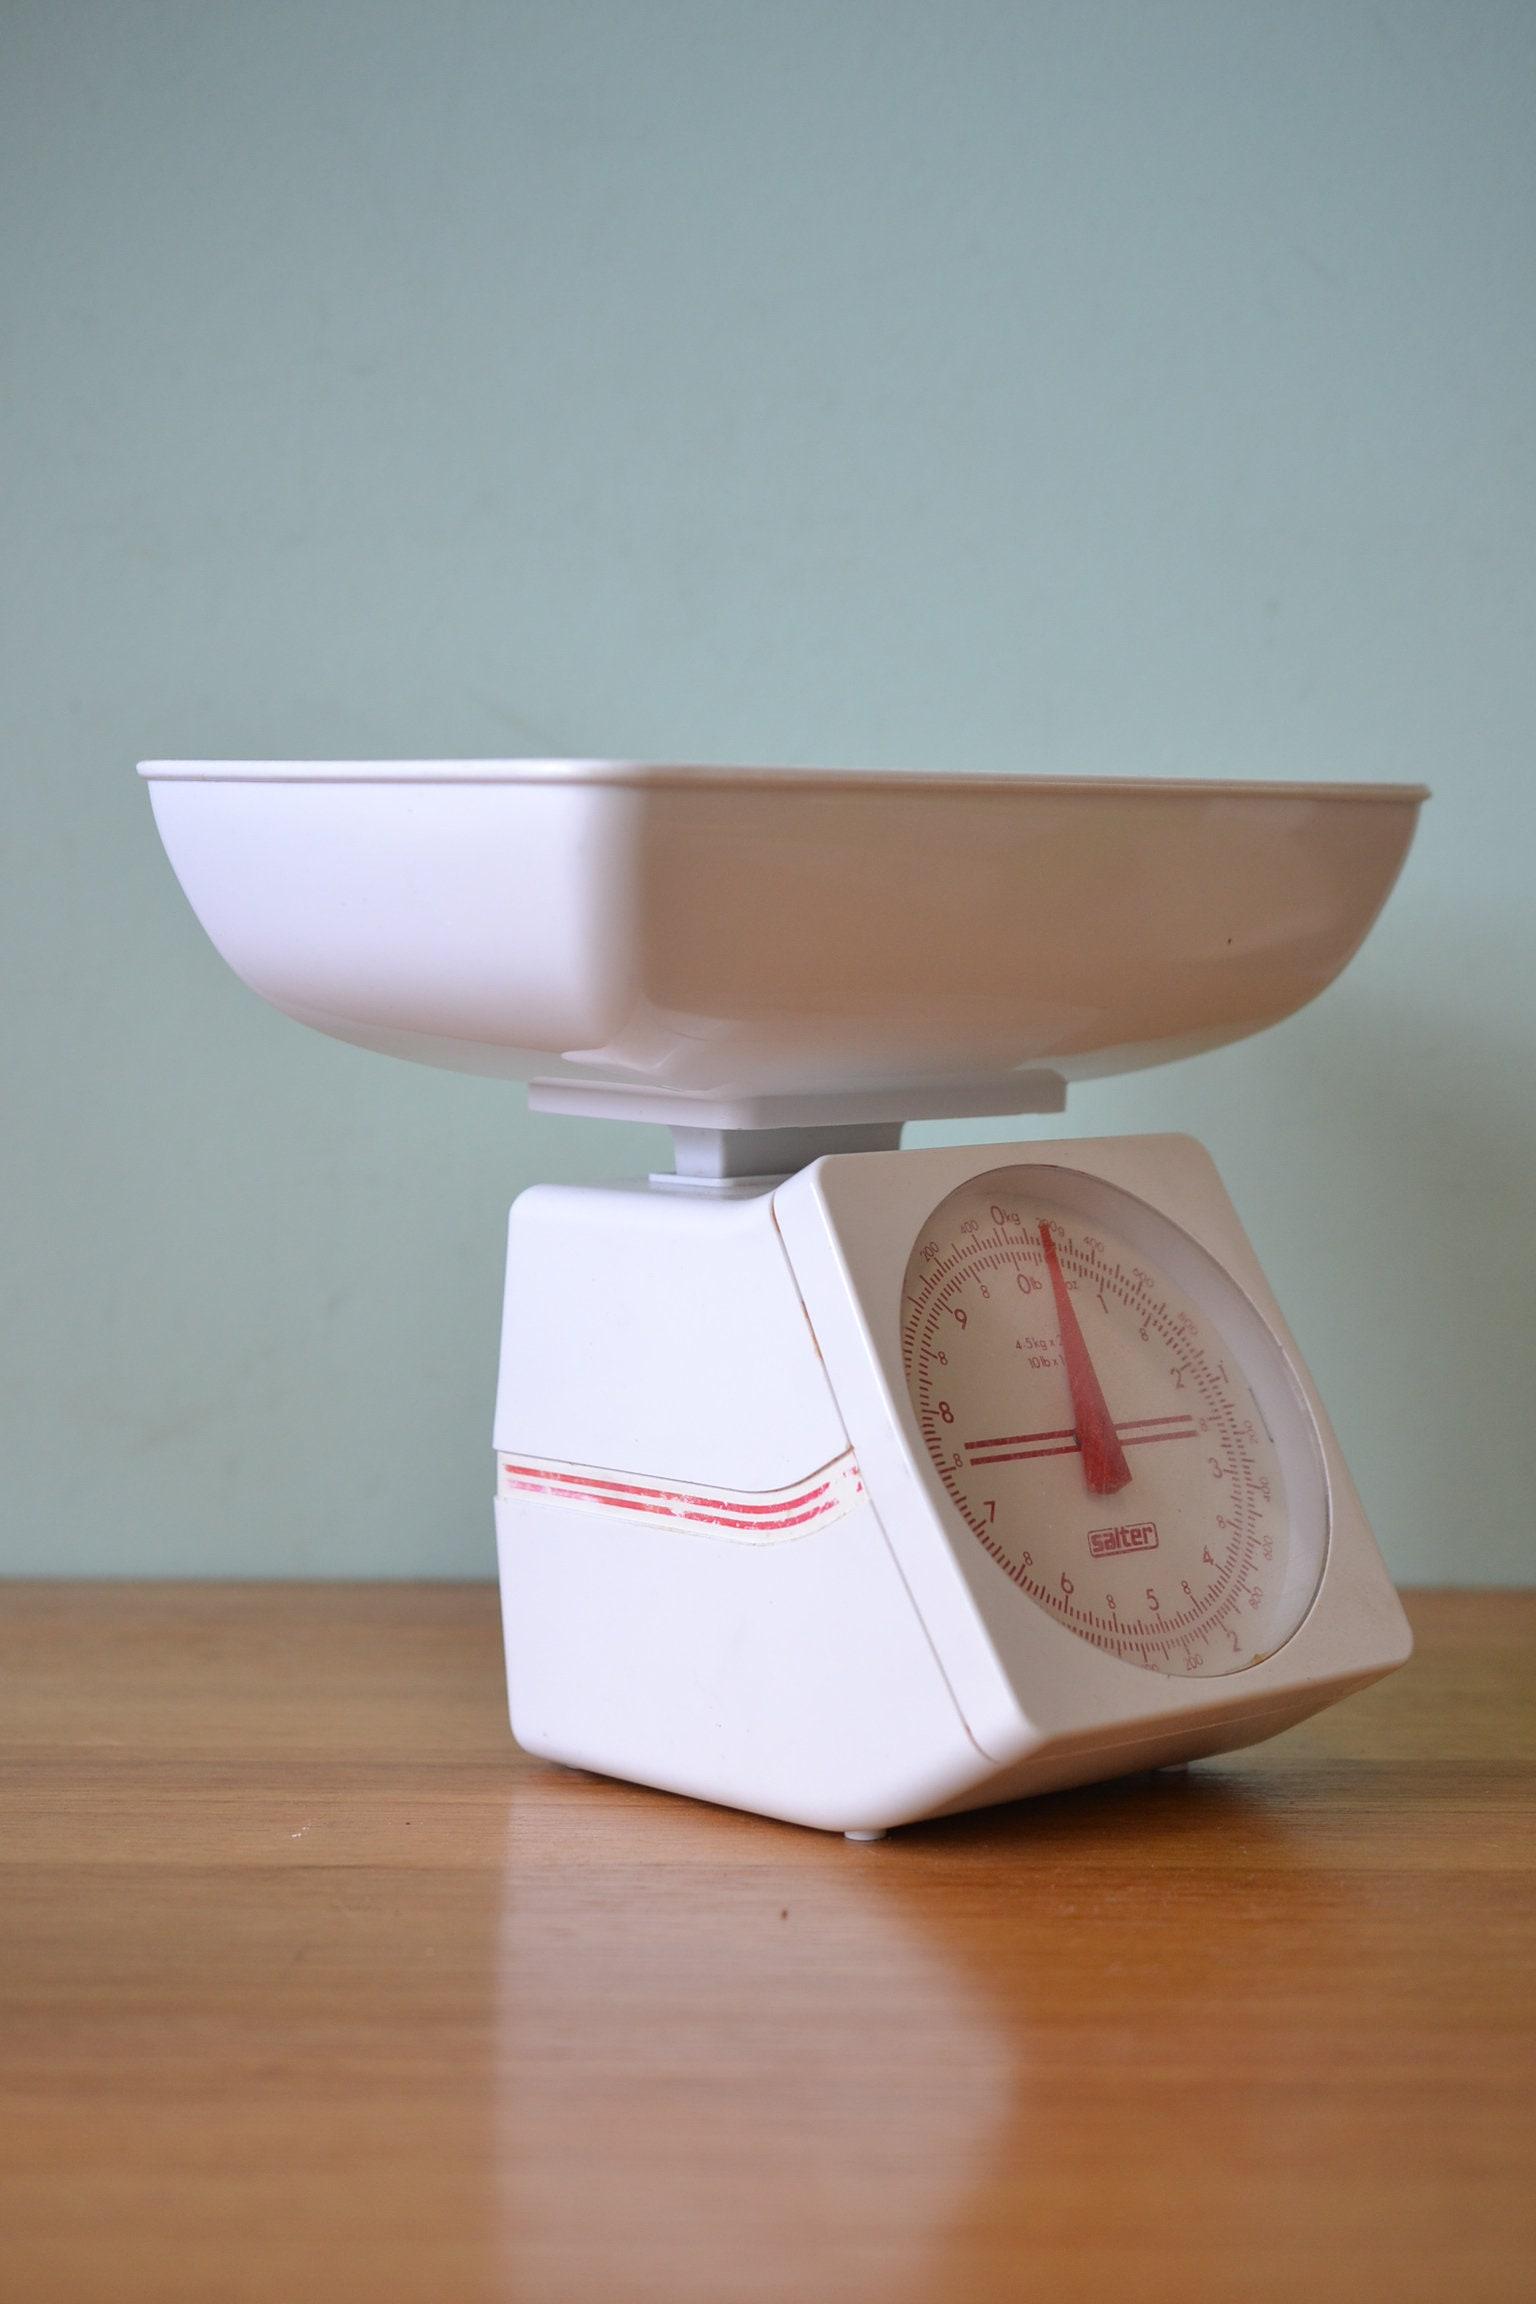 Retro white salter kitchen scales AGT3 | Etsy